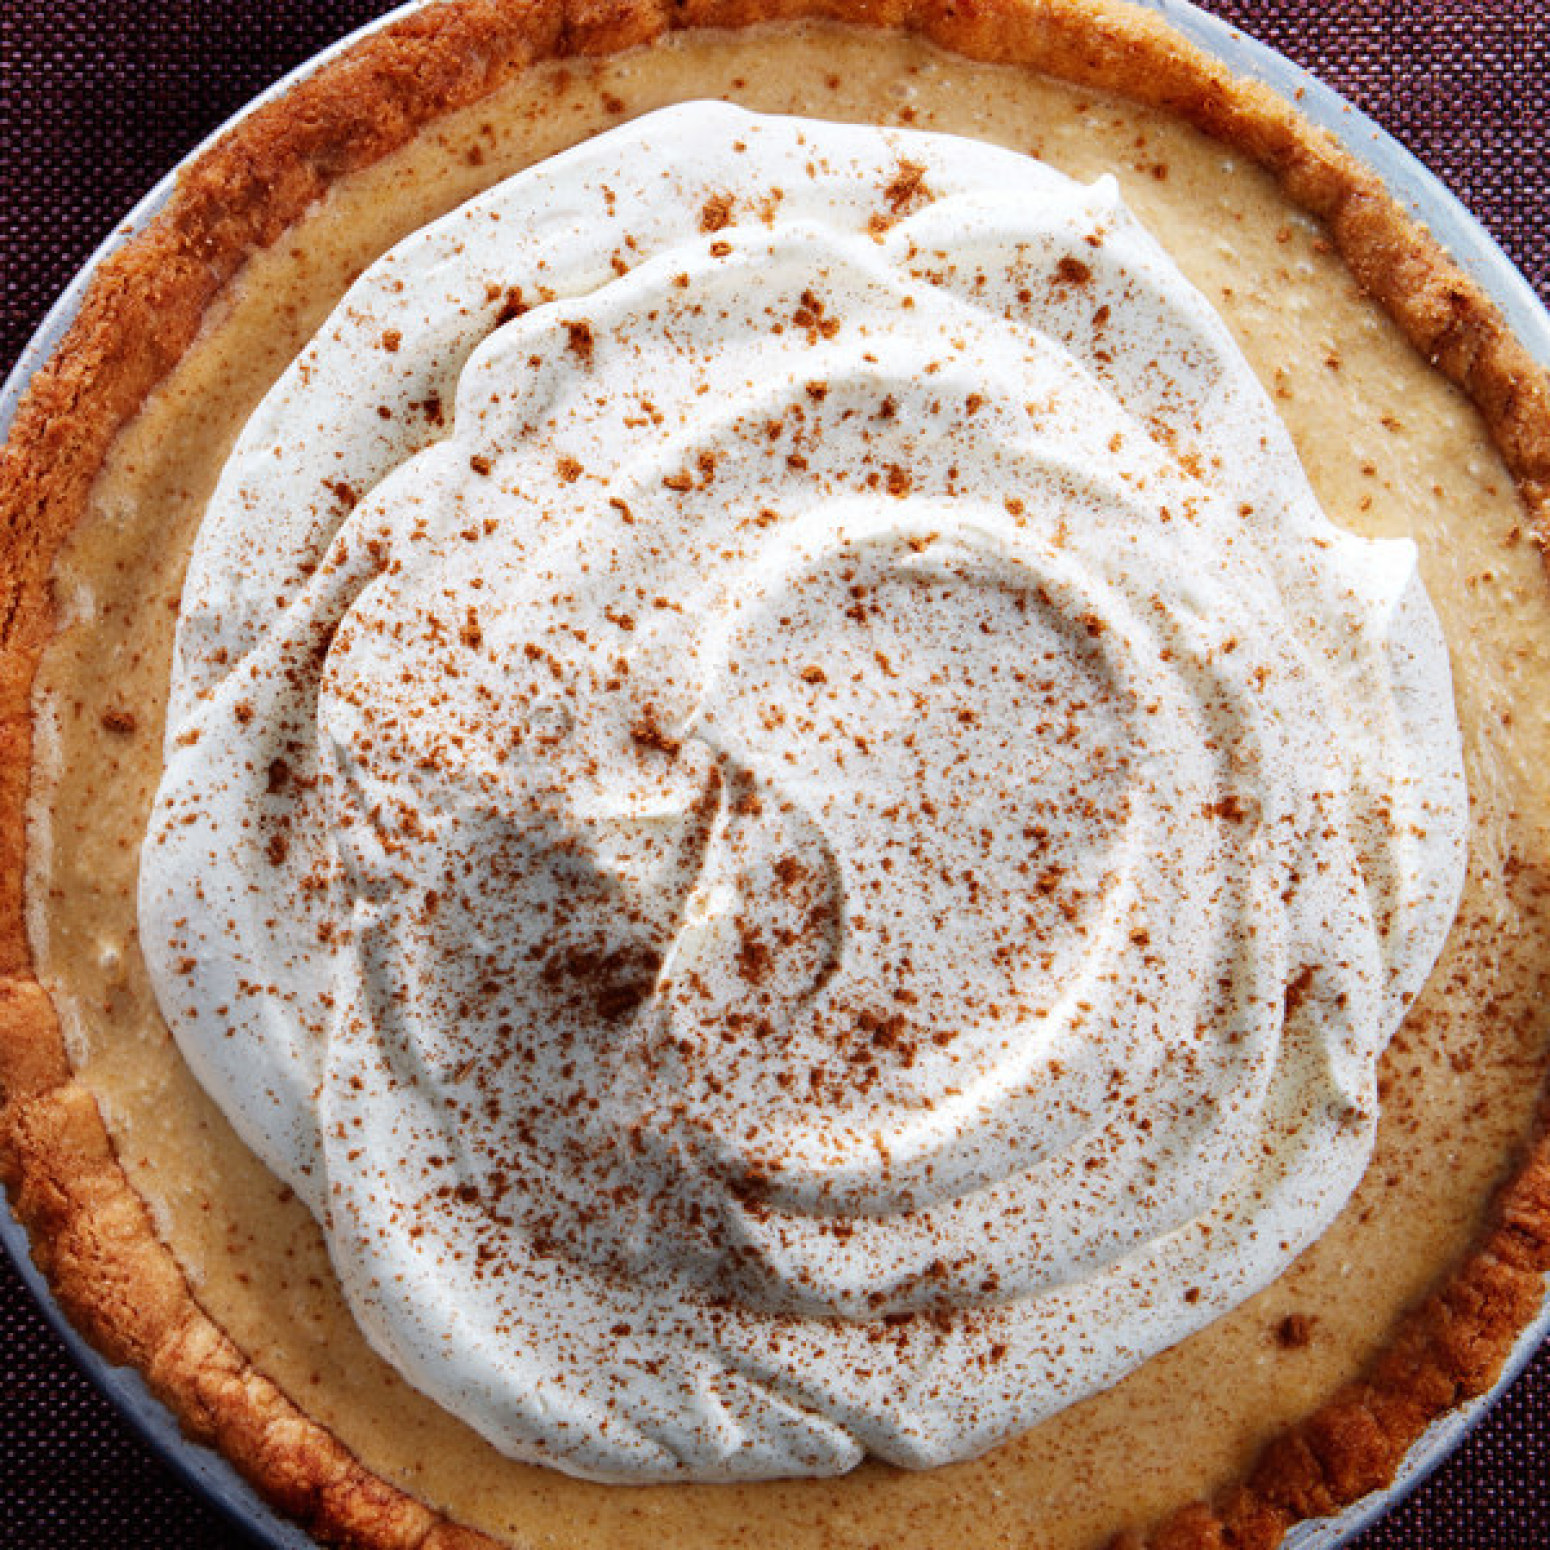 Pumpkin Icebox Pie With Snickerdoodle Crust Recipe 8 | Just A Pinch ...